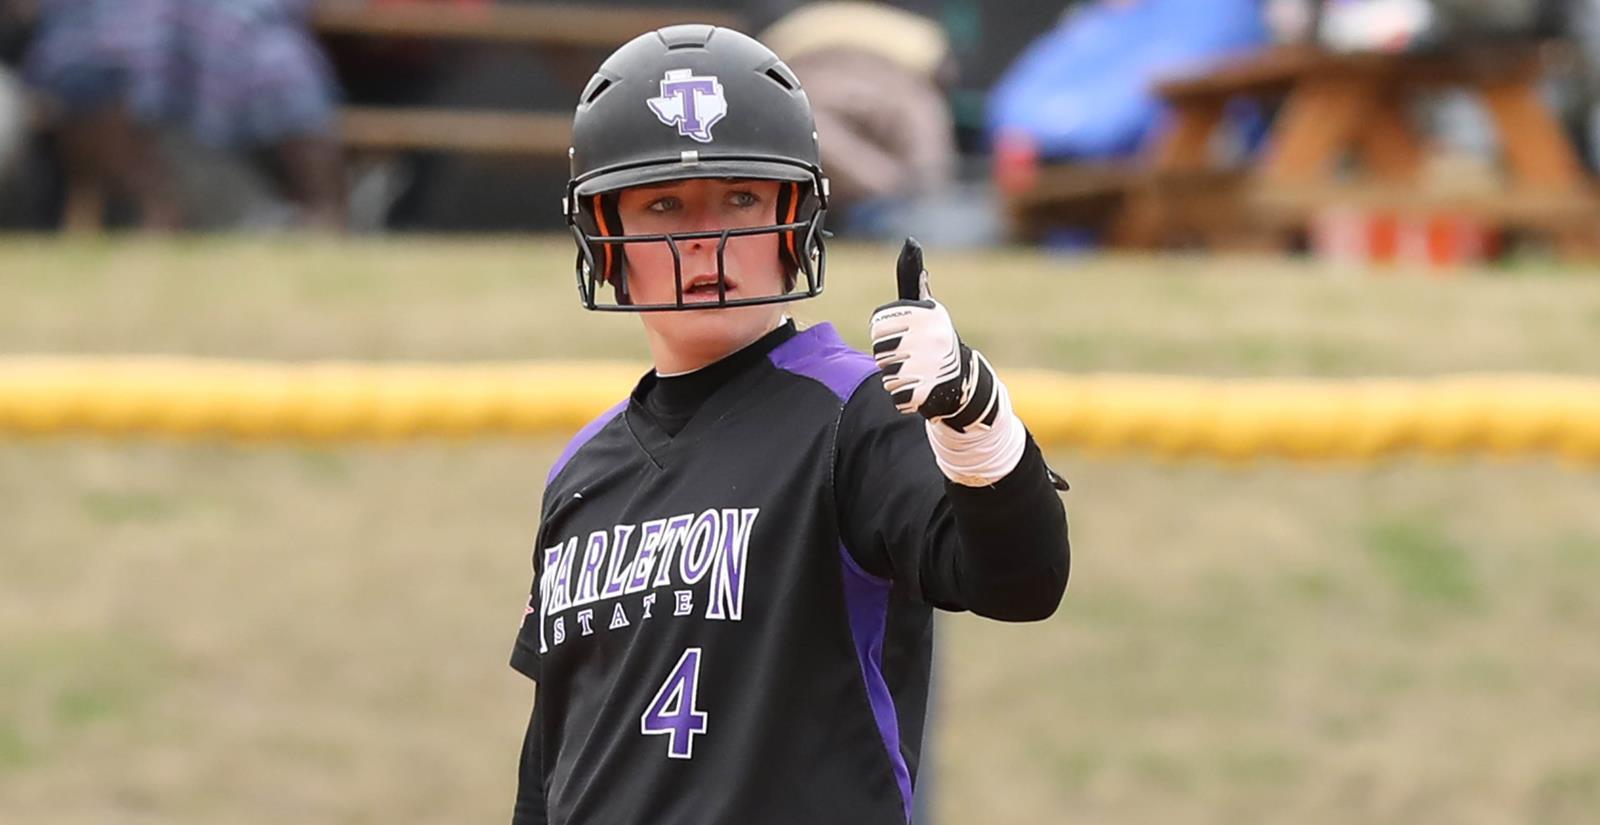 Tarleton softball Durante Thumbs Up